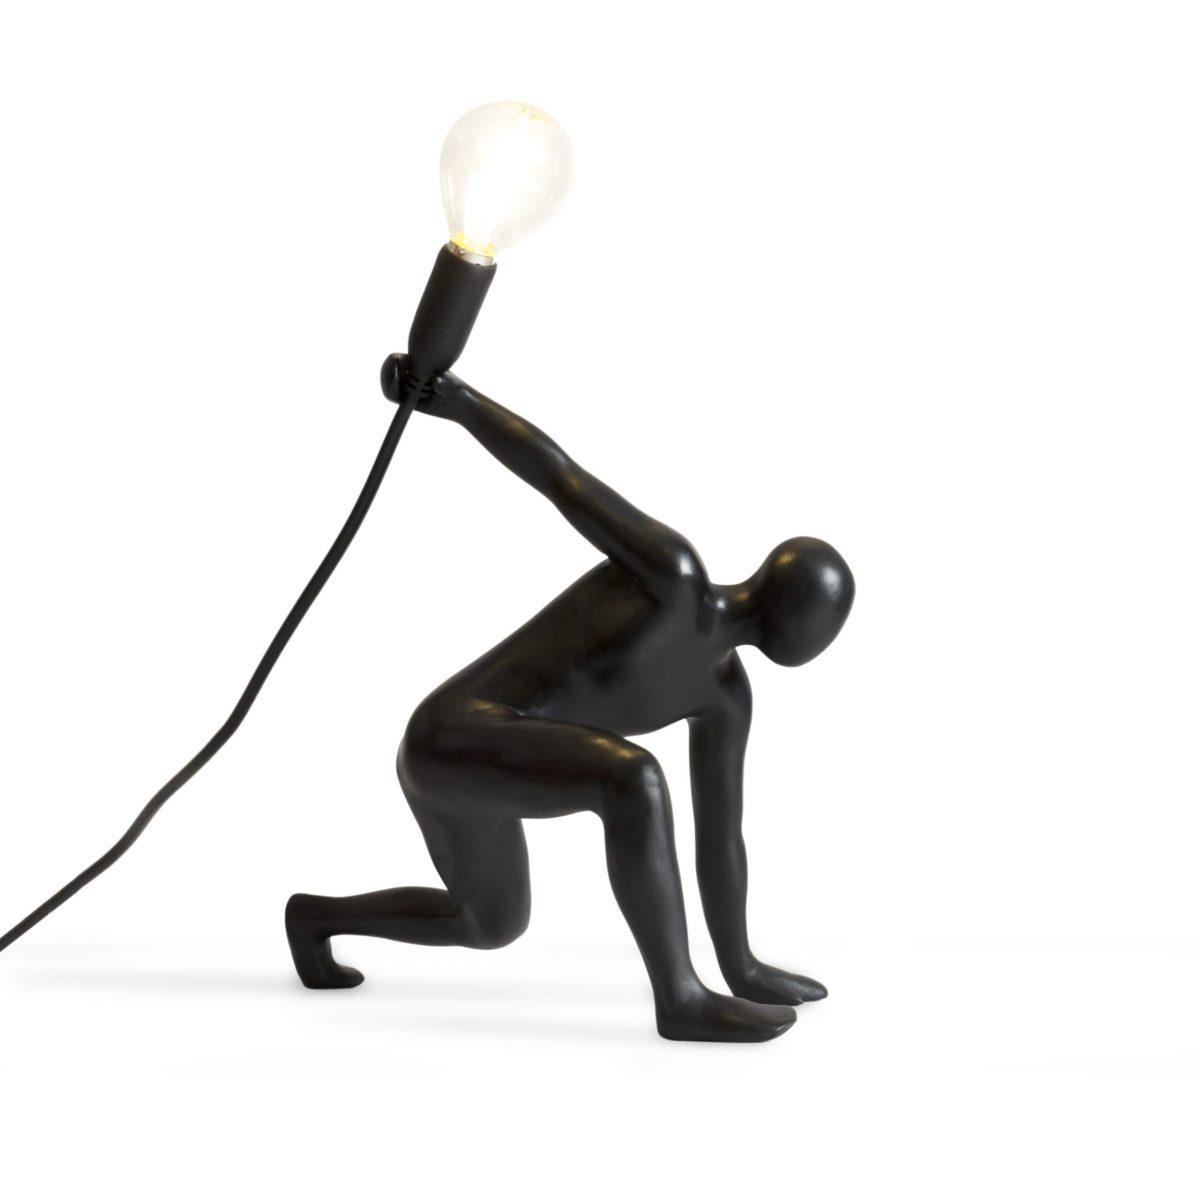 Werkwaardig Dancer Lamp Bureaulamp Tafellamp Dutch Design Creatief